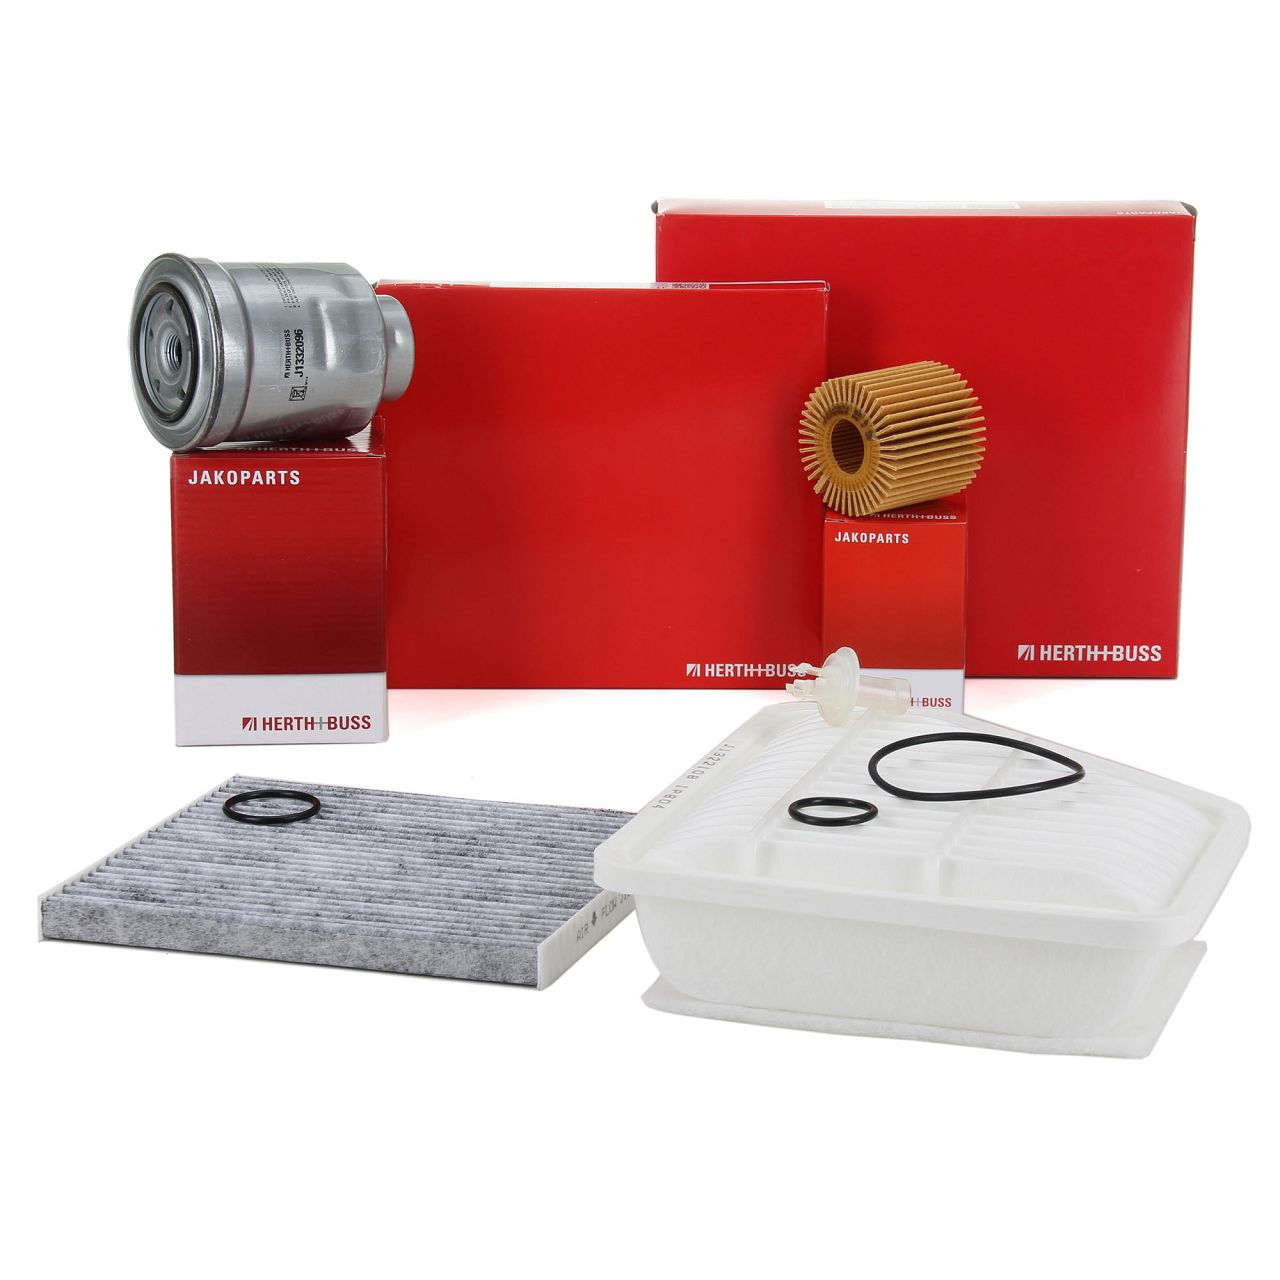 HERTH+BUSS JAKOPARTS Inspektionskit Filterpaket für TOYOTA AURIS 1.4D-4D 90 PS